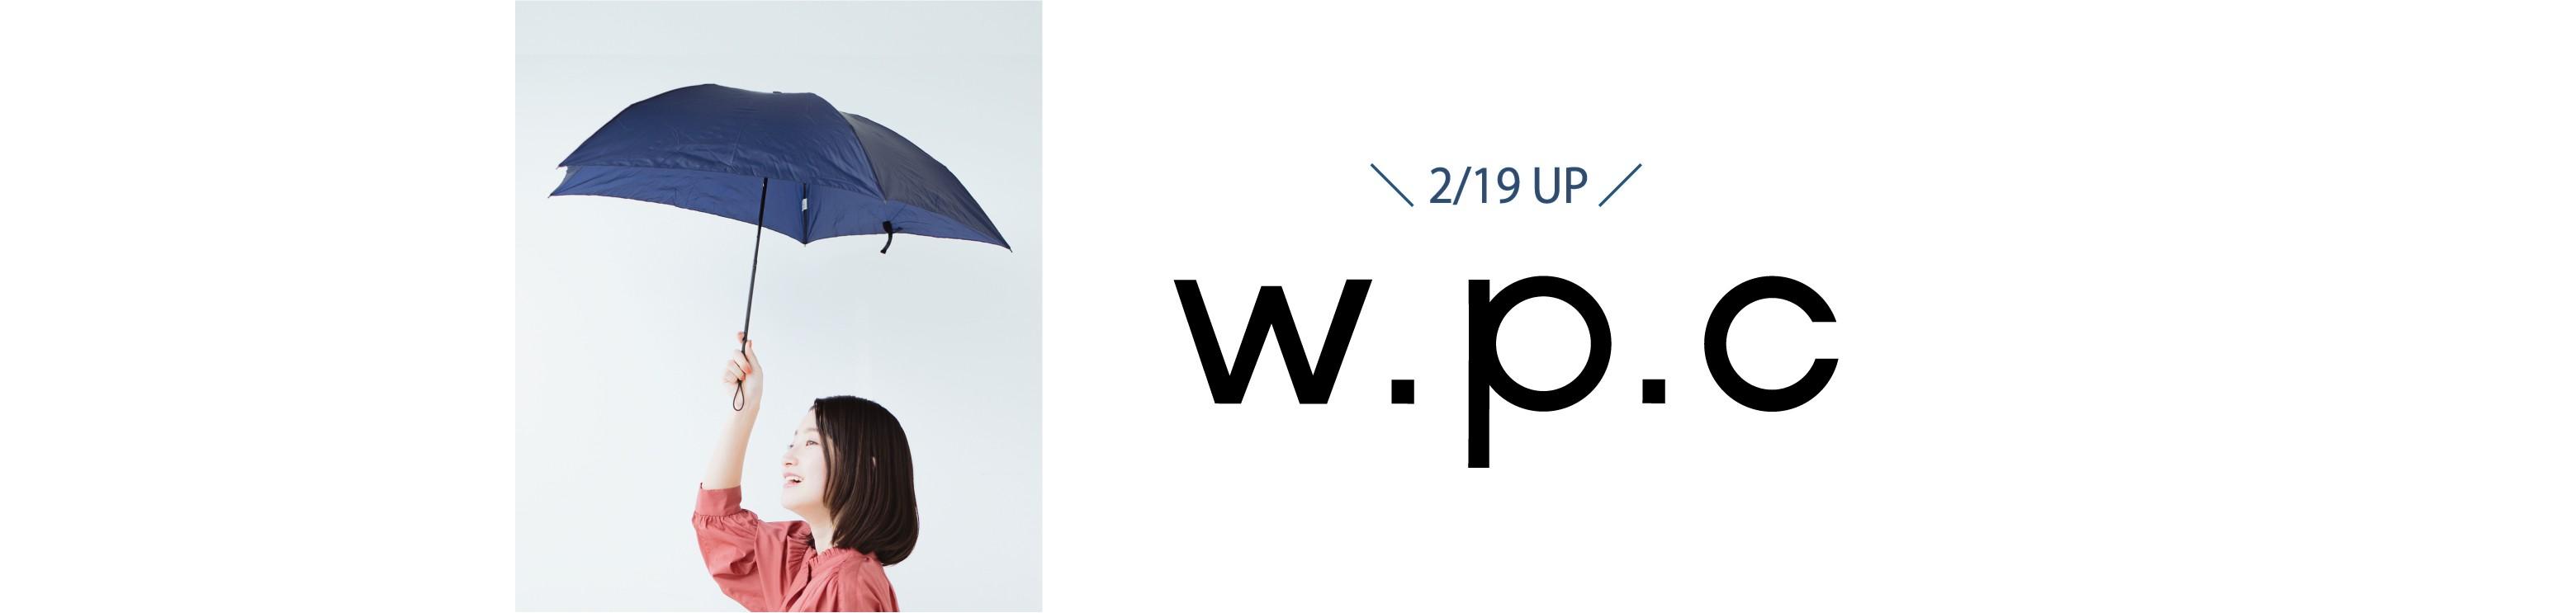 \2/19UP/ w.p.c